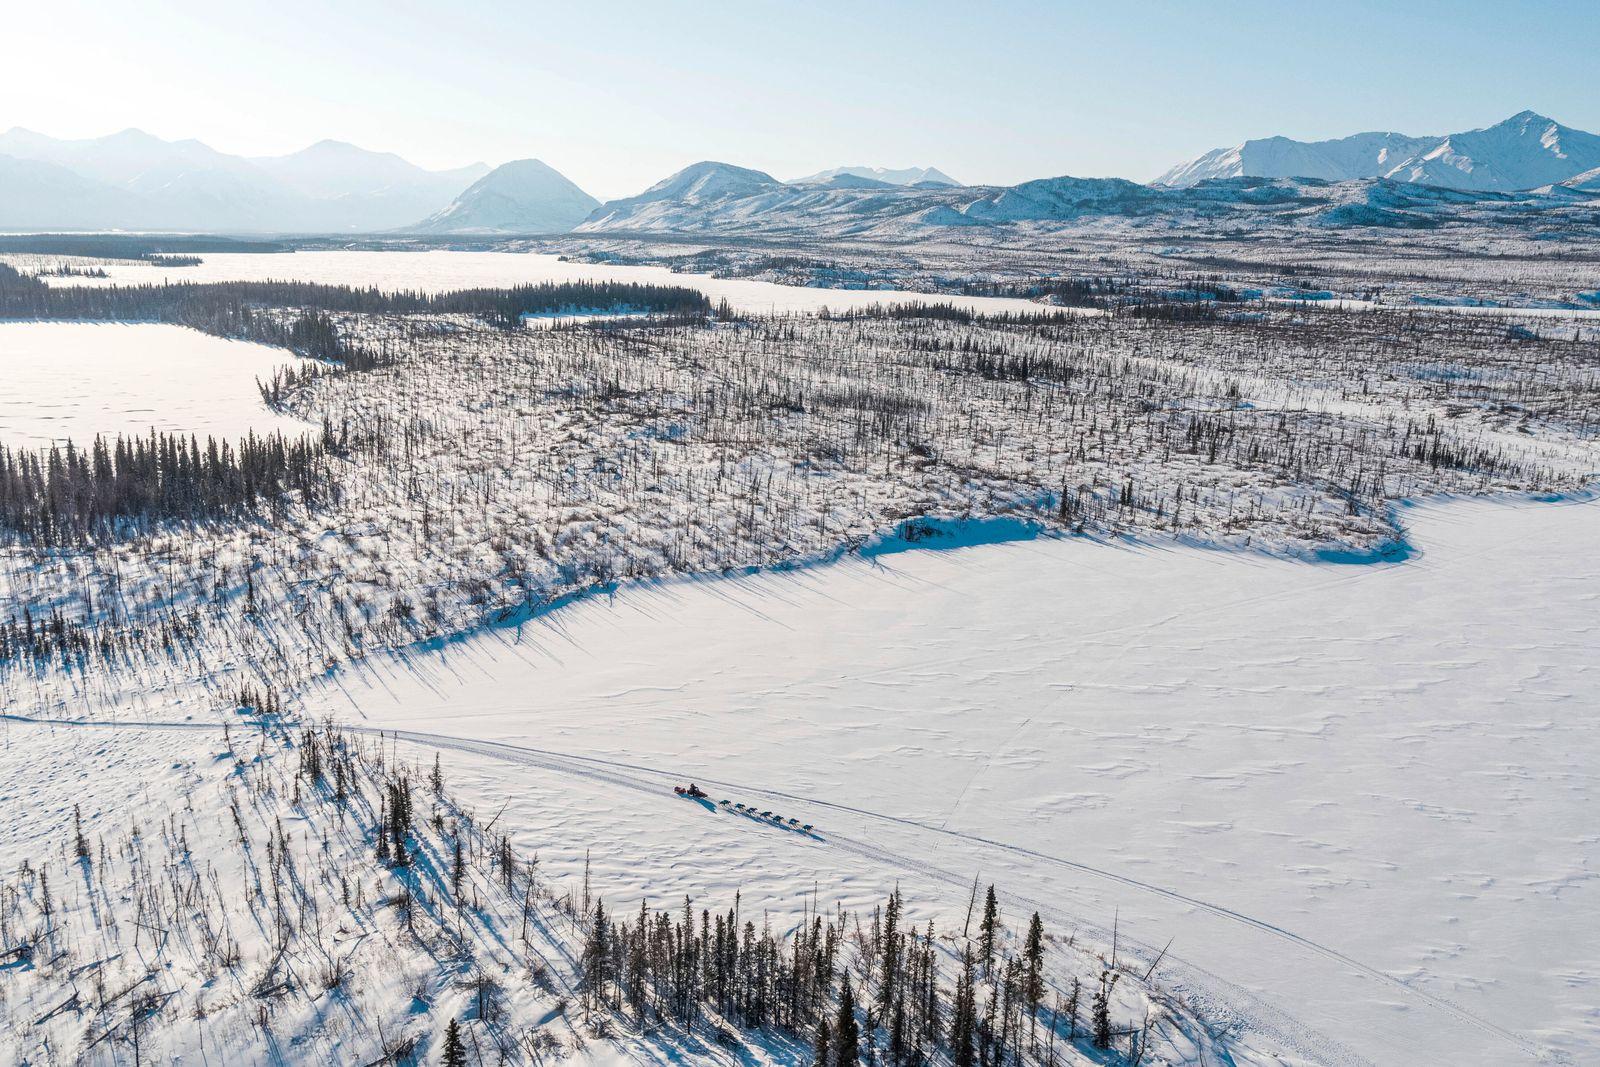 2020 Iditarod, Iditarod 2020, Linwood Fiedler, farewell burn, iditarod, submarine lake